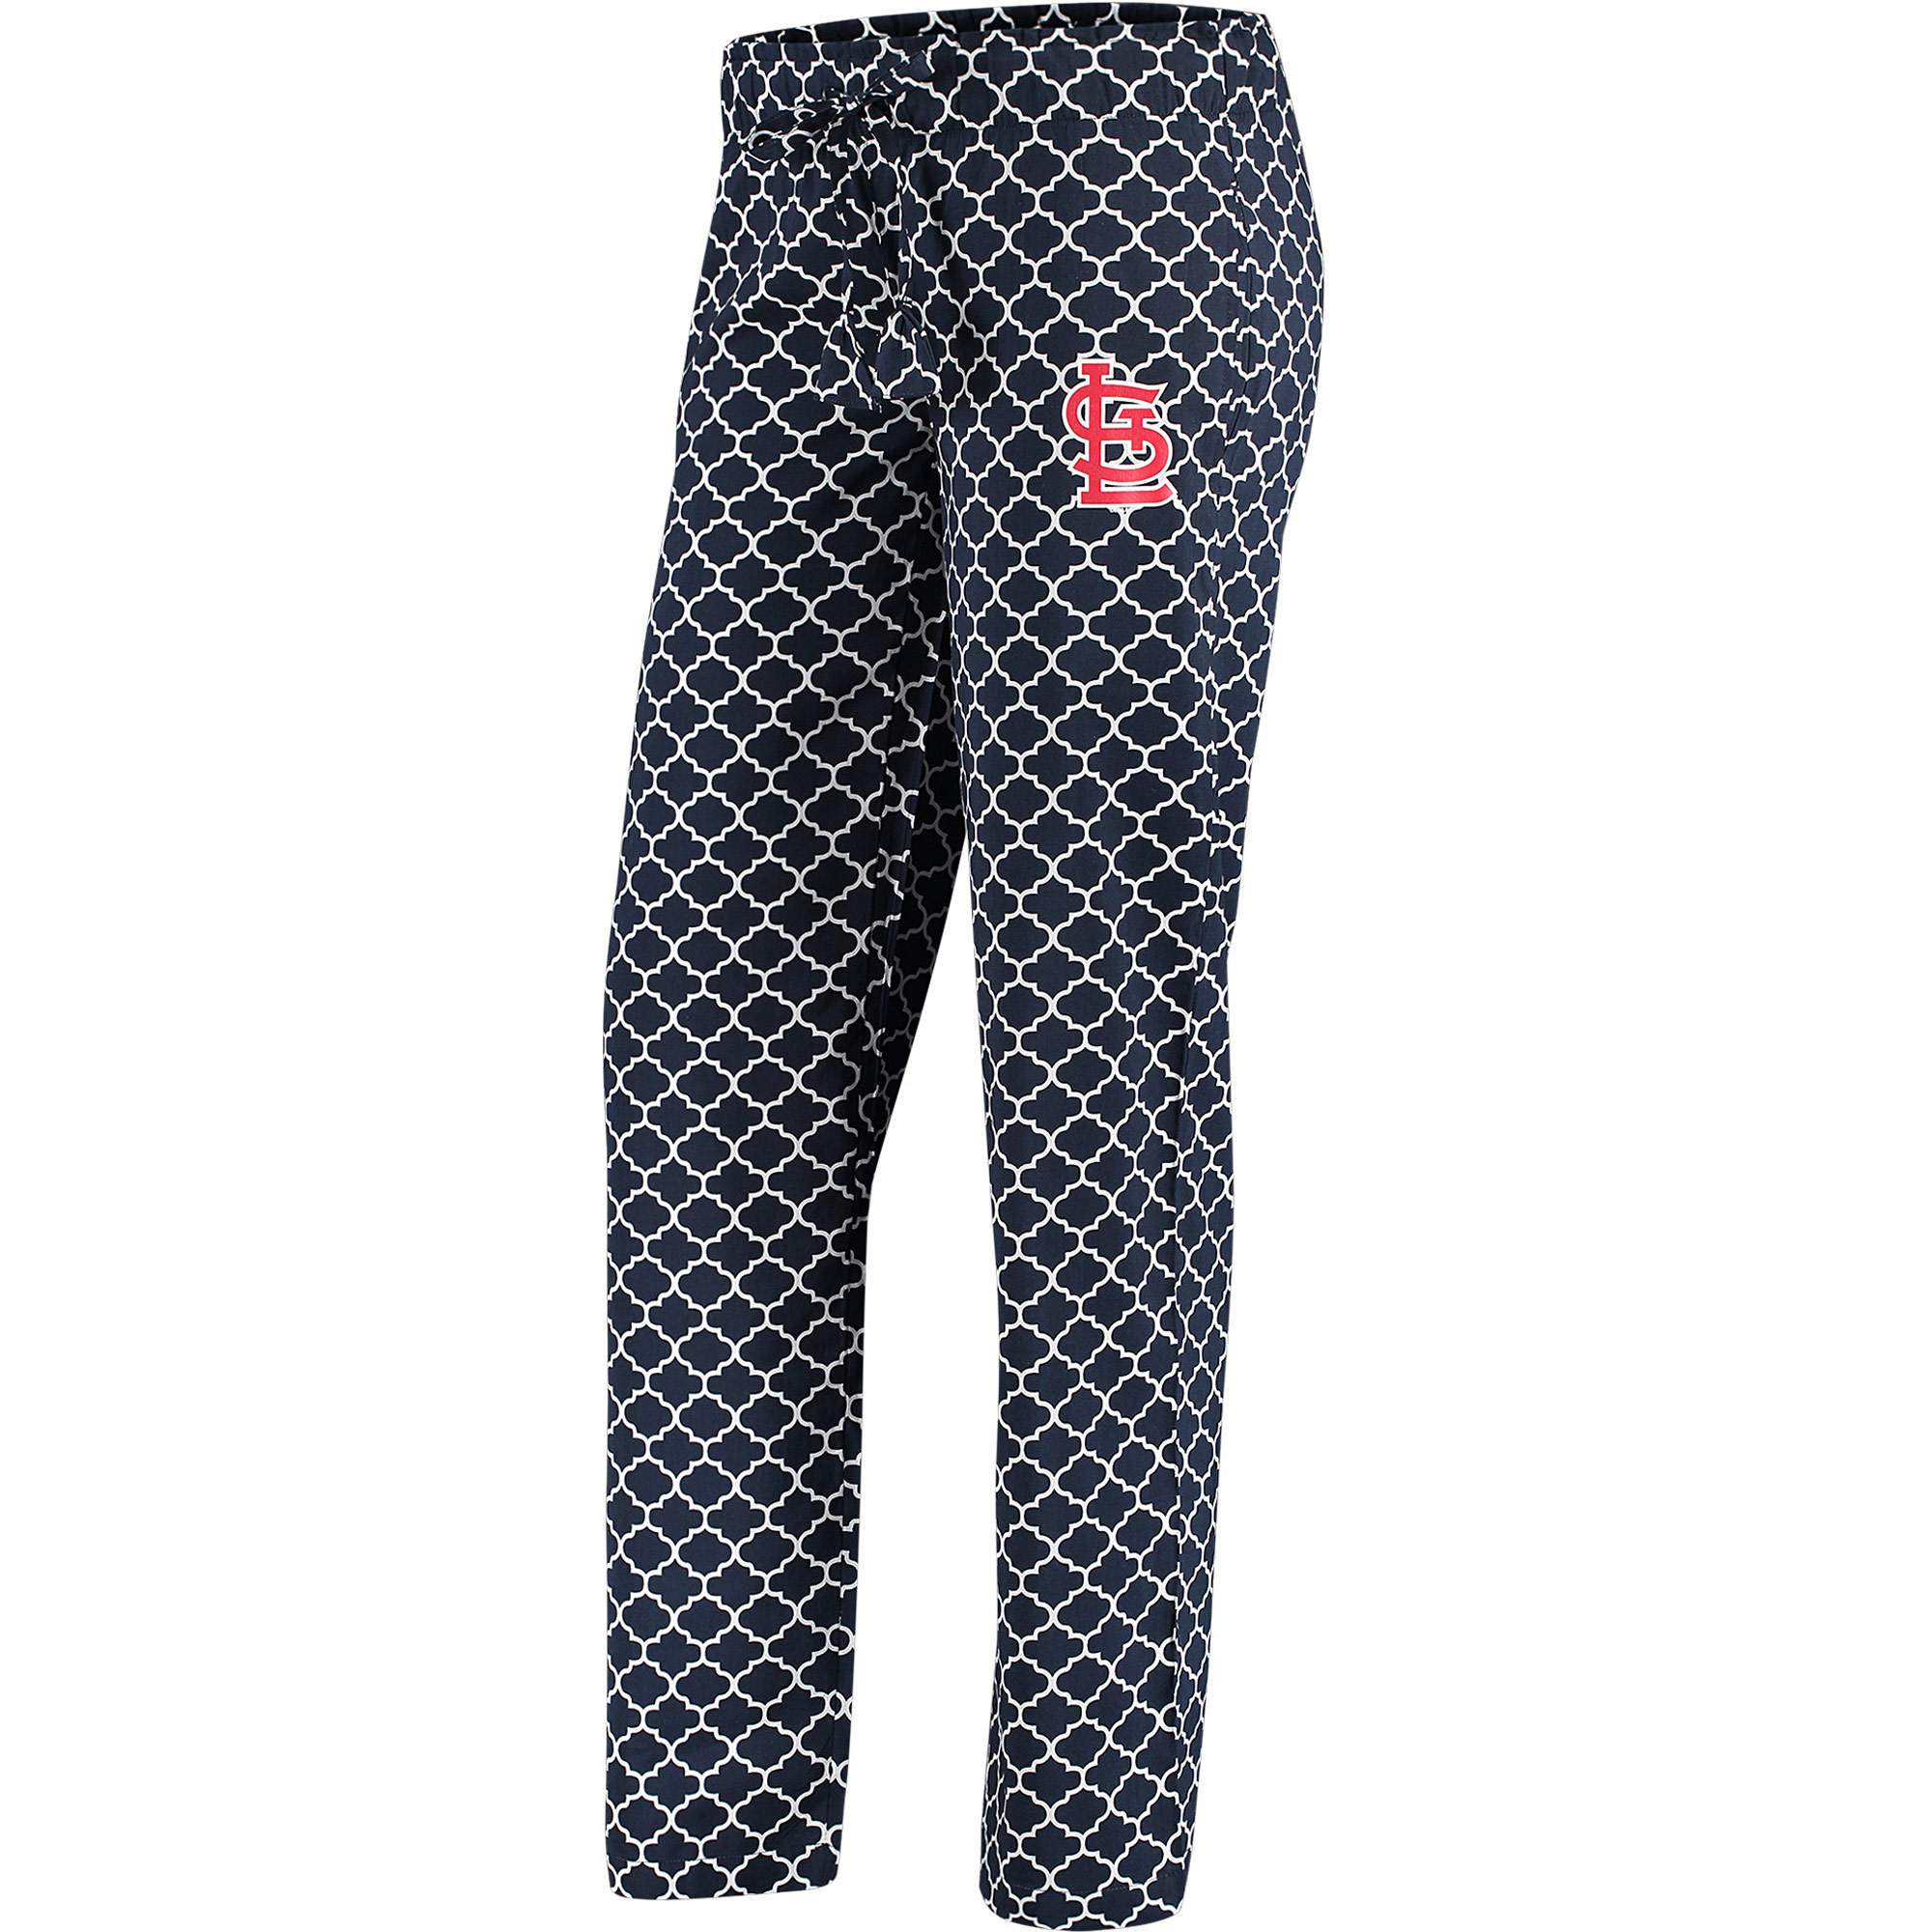 St. Louis Cardinals Concepts Sport Women's Slumber Sleep Pants - Navy/White